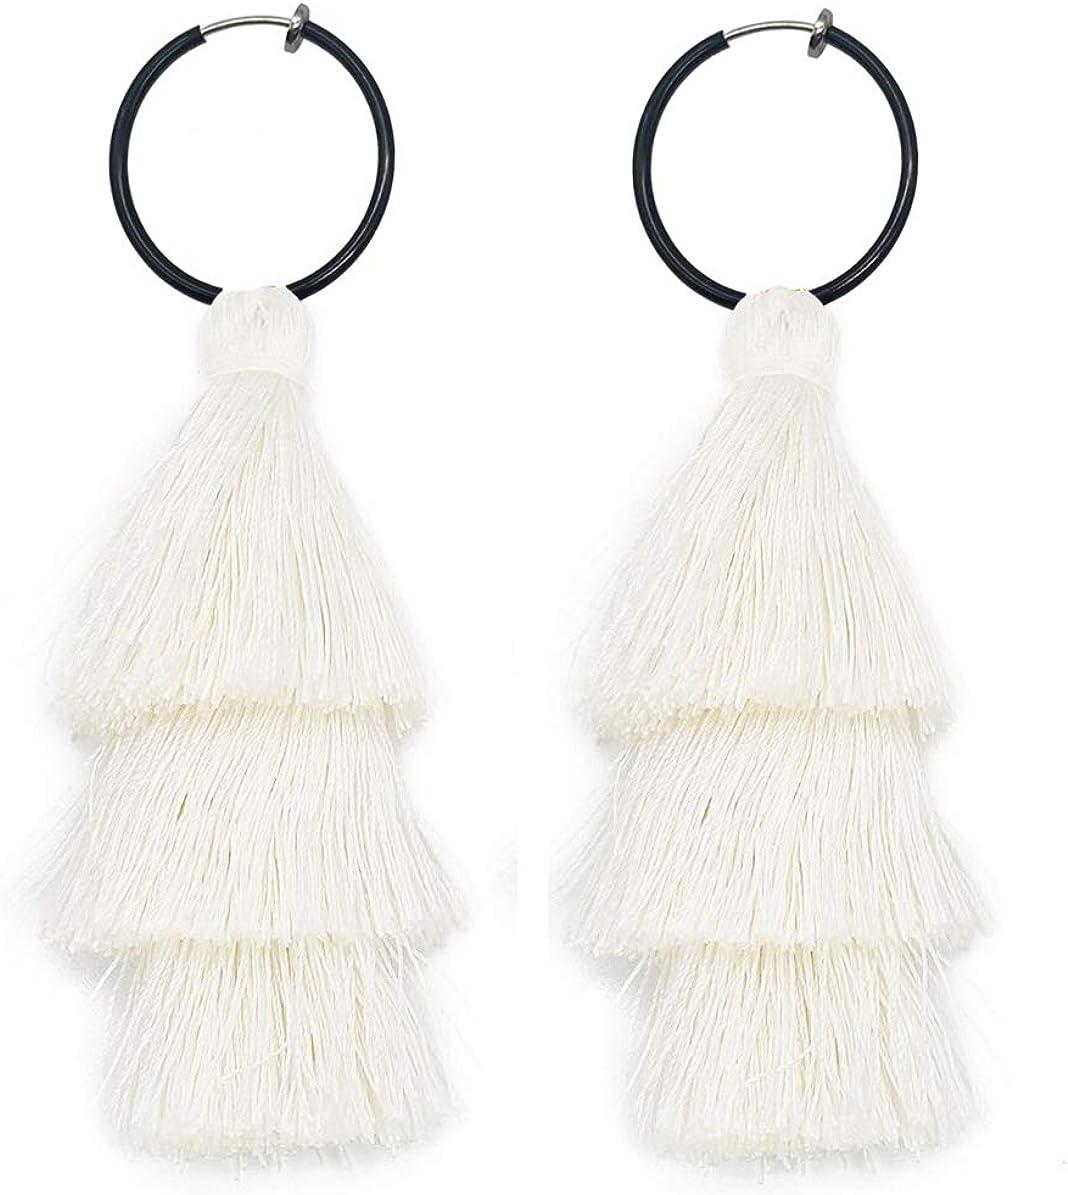 SELOVO Boho Tassel Clip on Spring Back Hoop Earrings No Pierced Dangle Earing